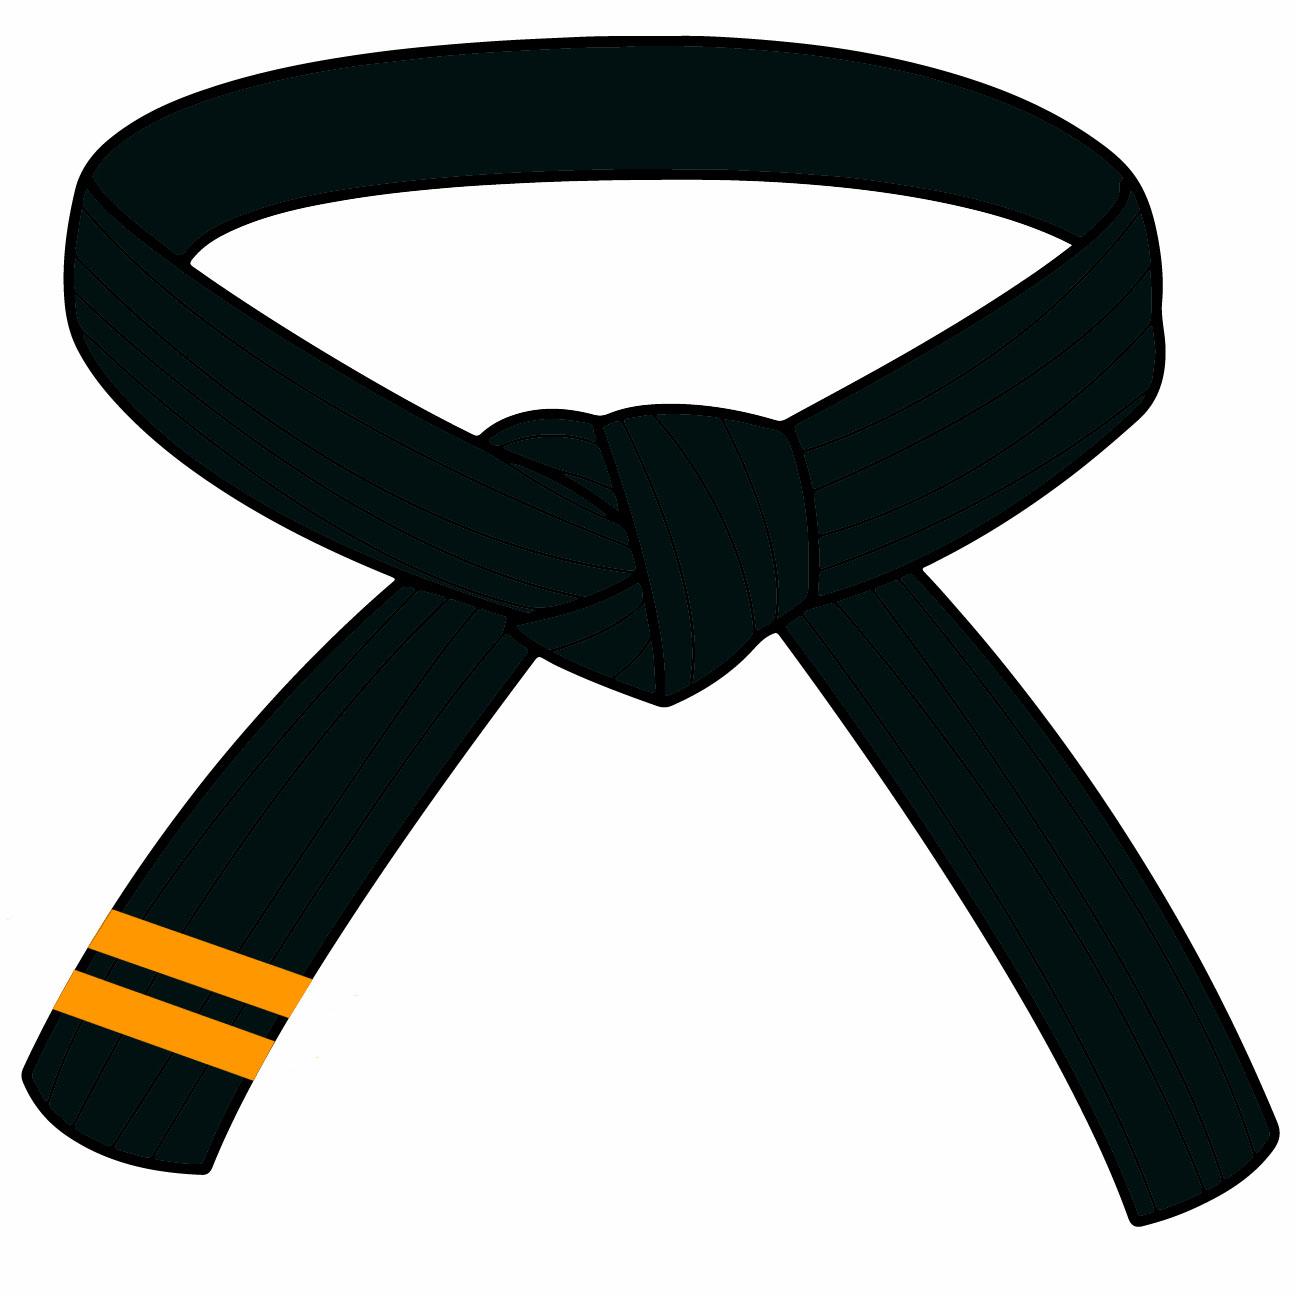 Black belt clipart 4 » Clipart Station.